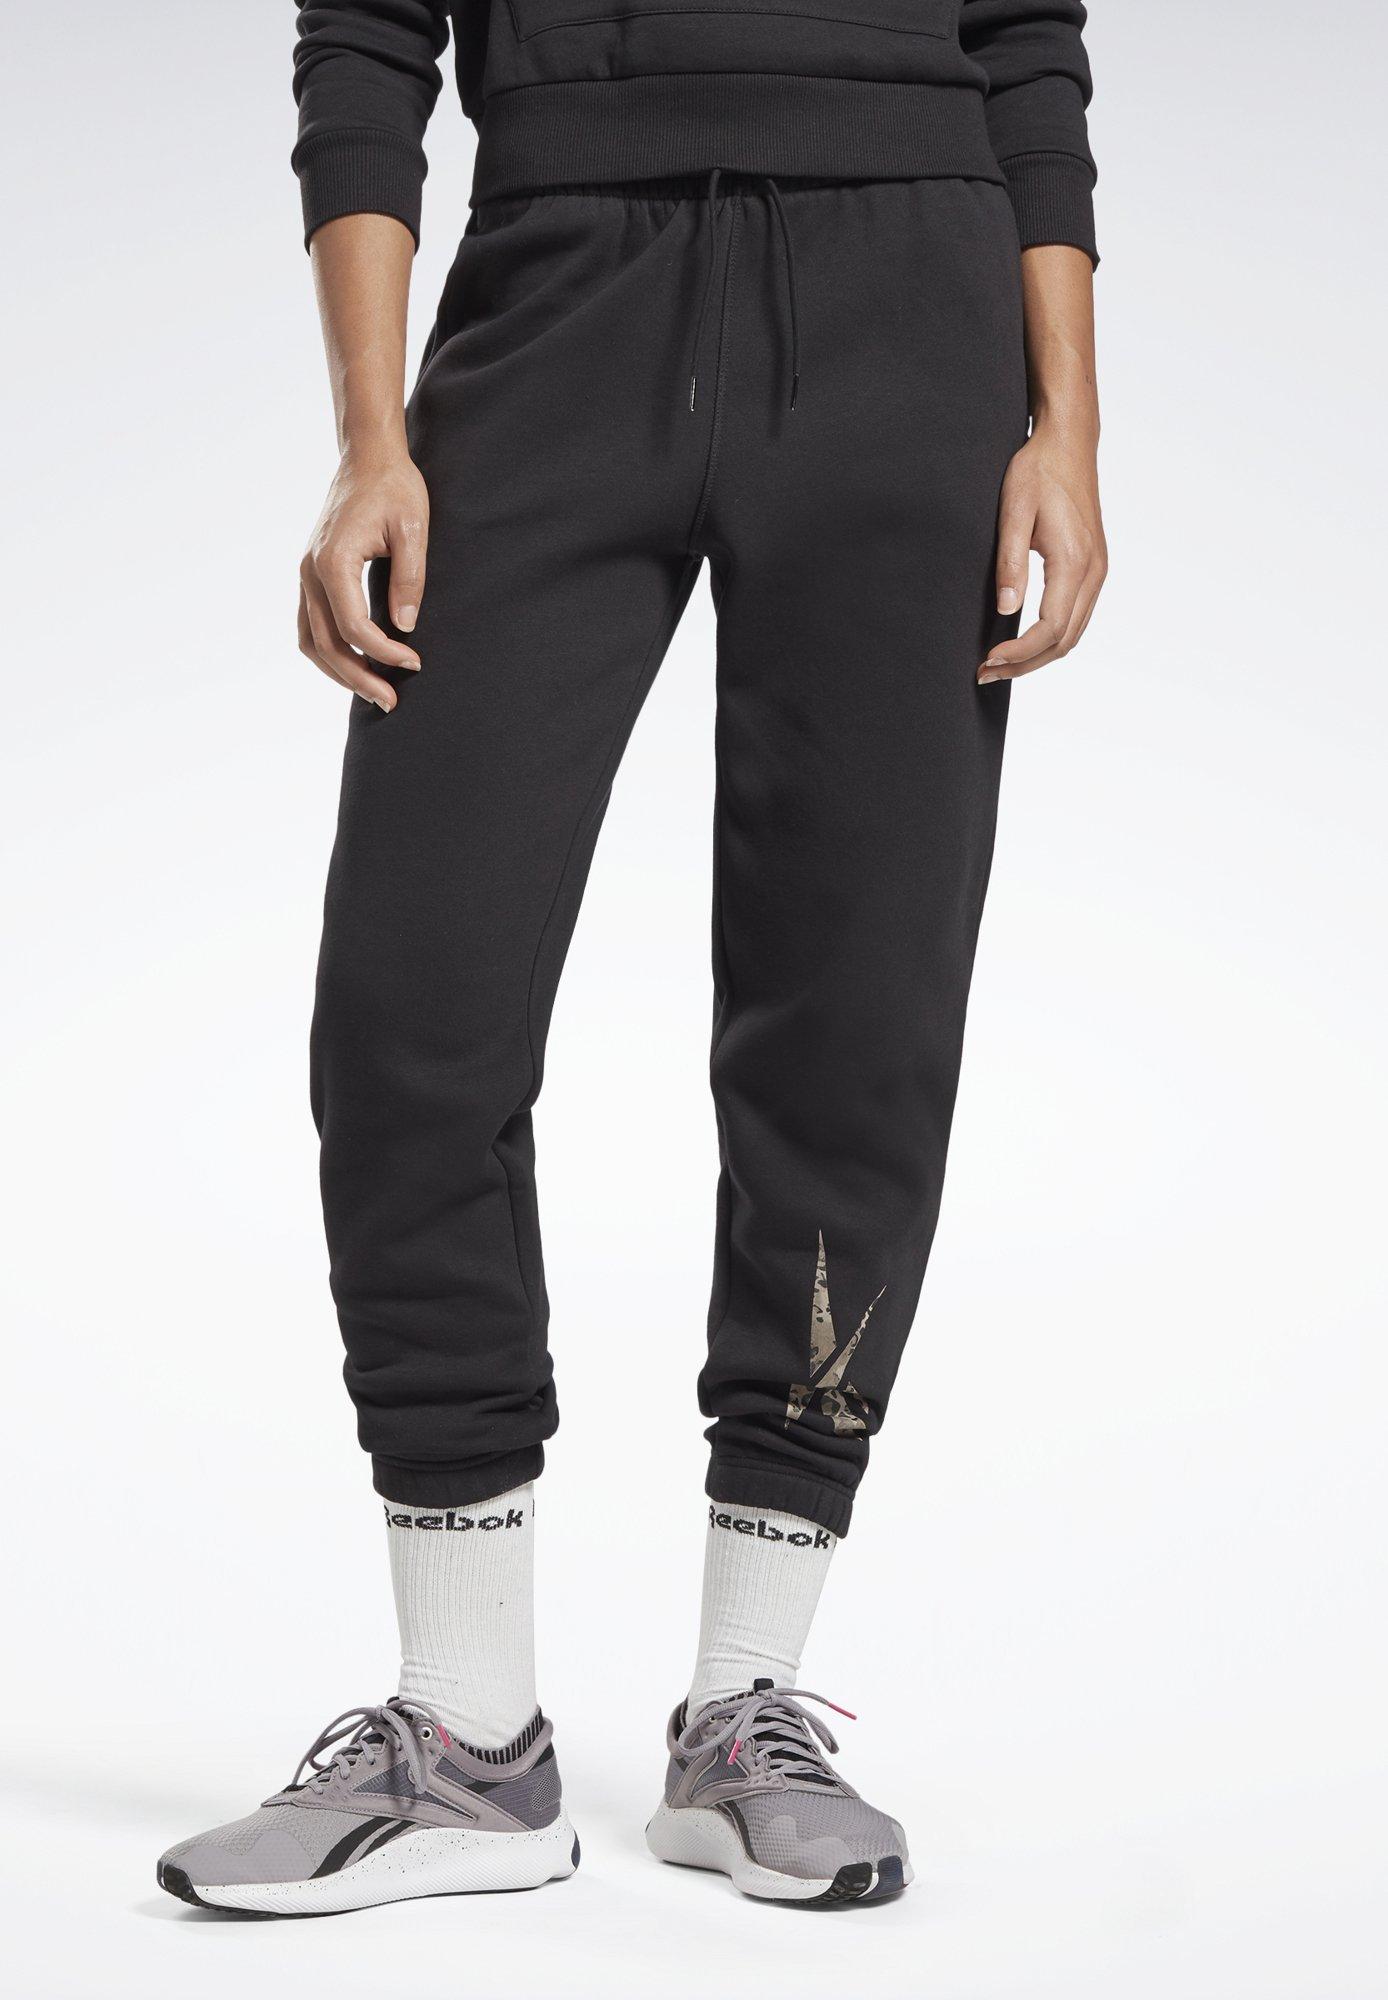 Femme MODERN SAFARI PANTS - Pantalon de survêtement